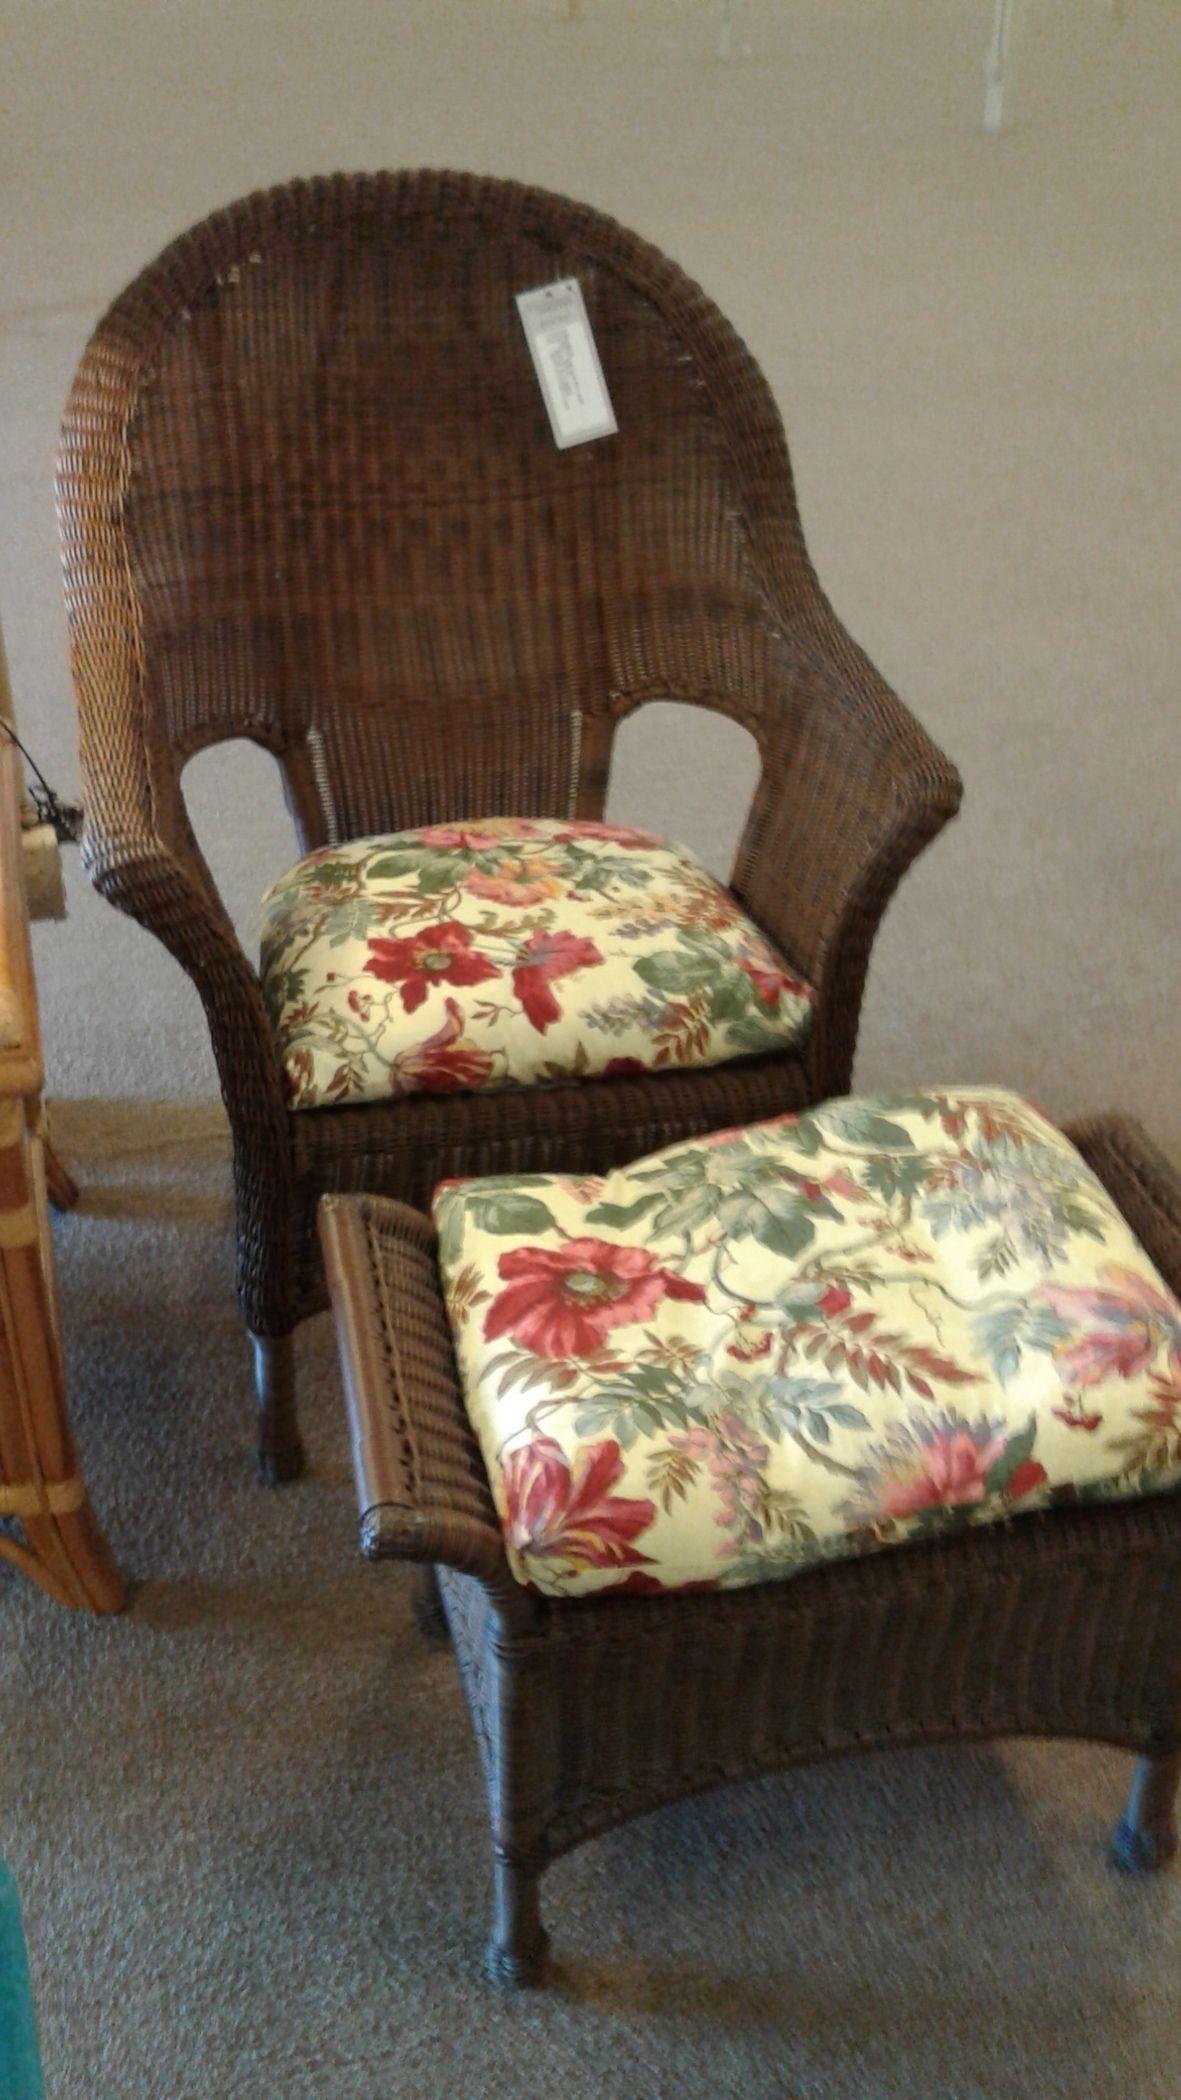 outdoor wicker chair ottoman delmarva furniture consignment. Black Bedroom Furniture Sets. Home Design Ideas